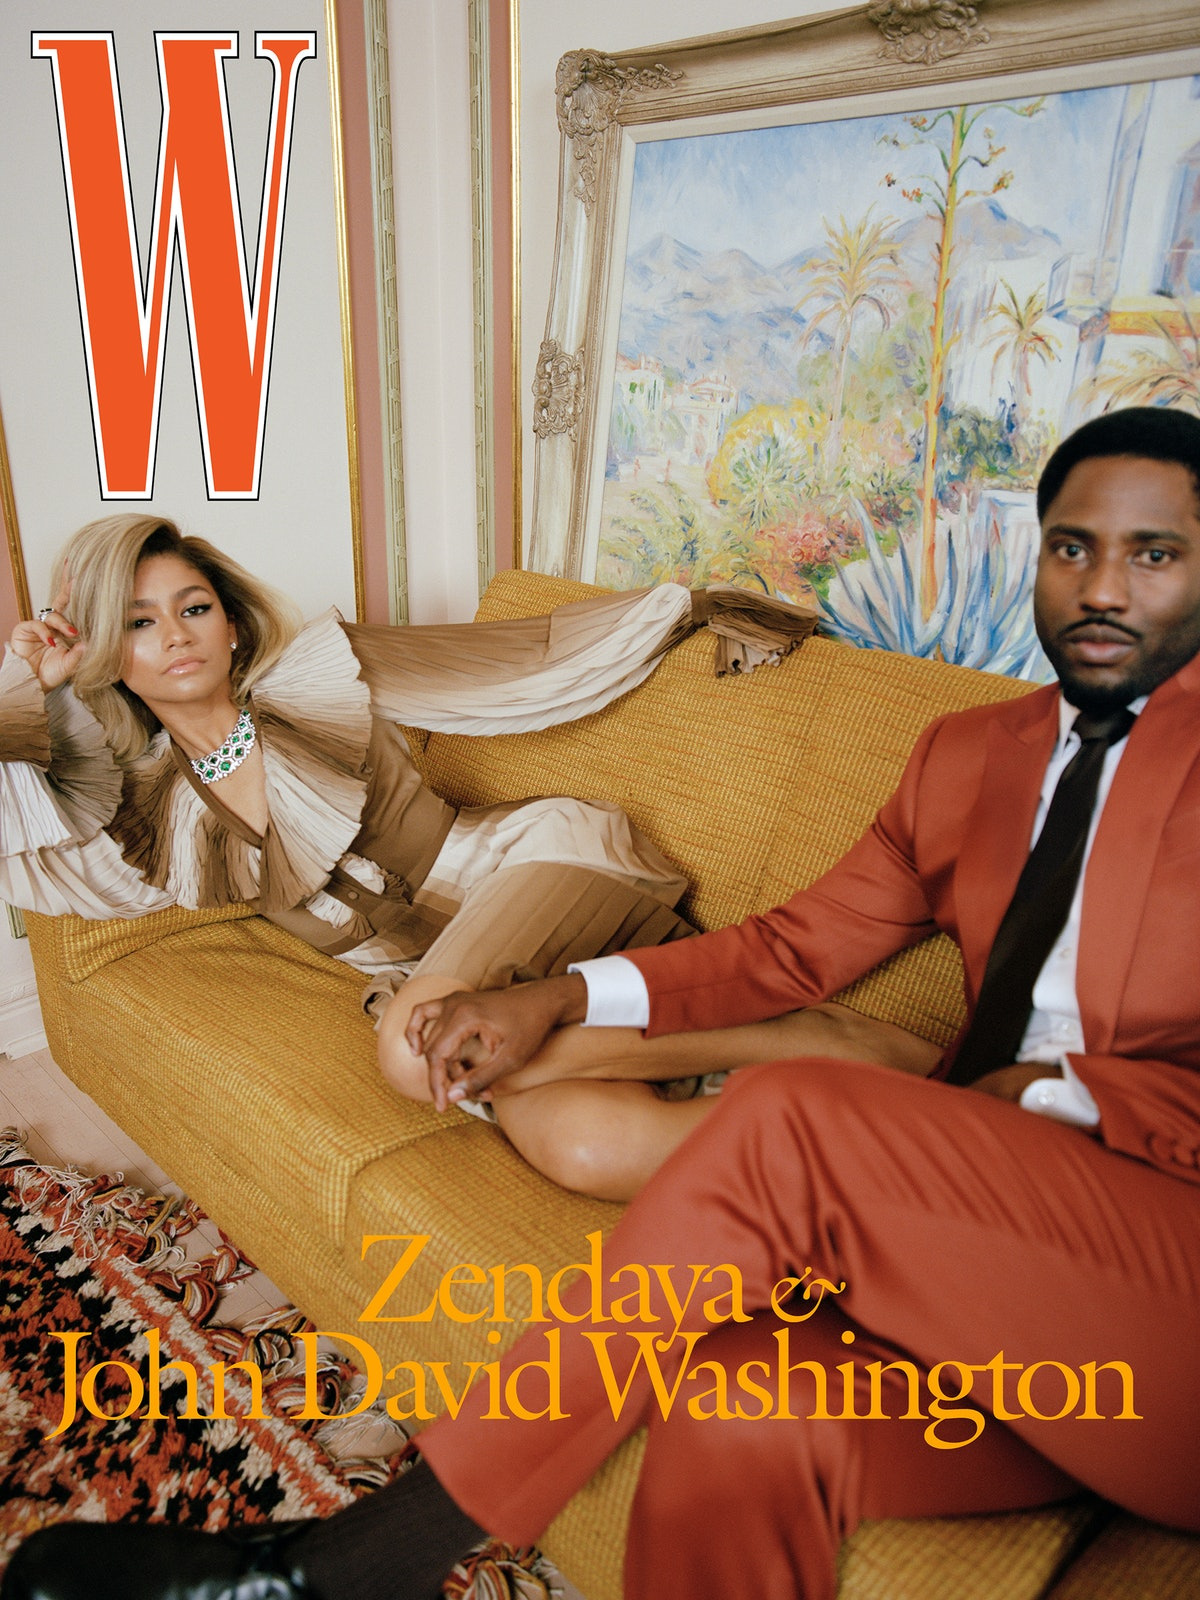 Zendaya wears a Gucci dress; Bulgari earrings, necklace, and ring. John David Washington wears a Frère suit, shirt, and tie; Falke socks; Dolce & Gabbana shoes.